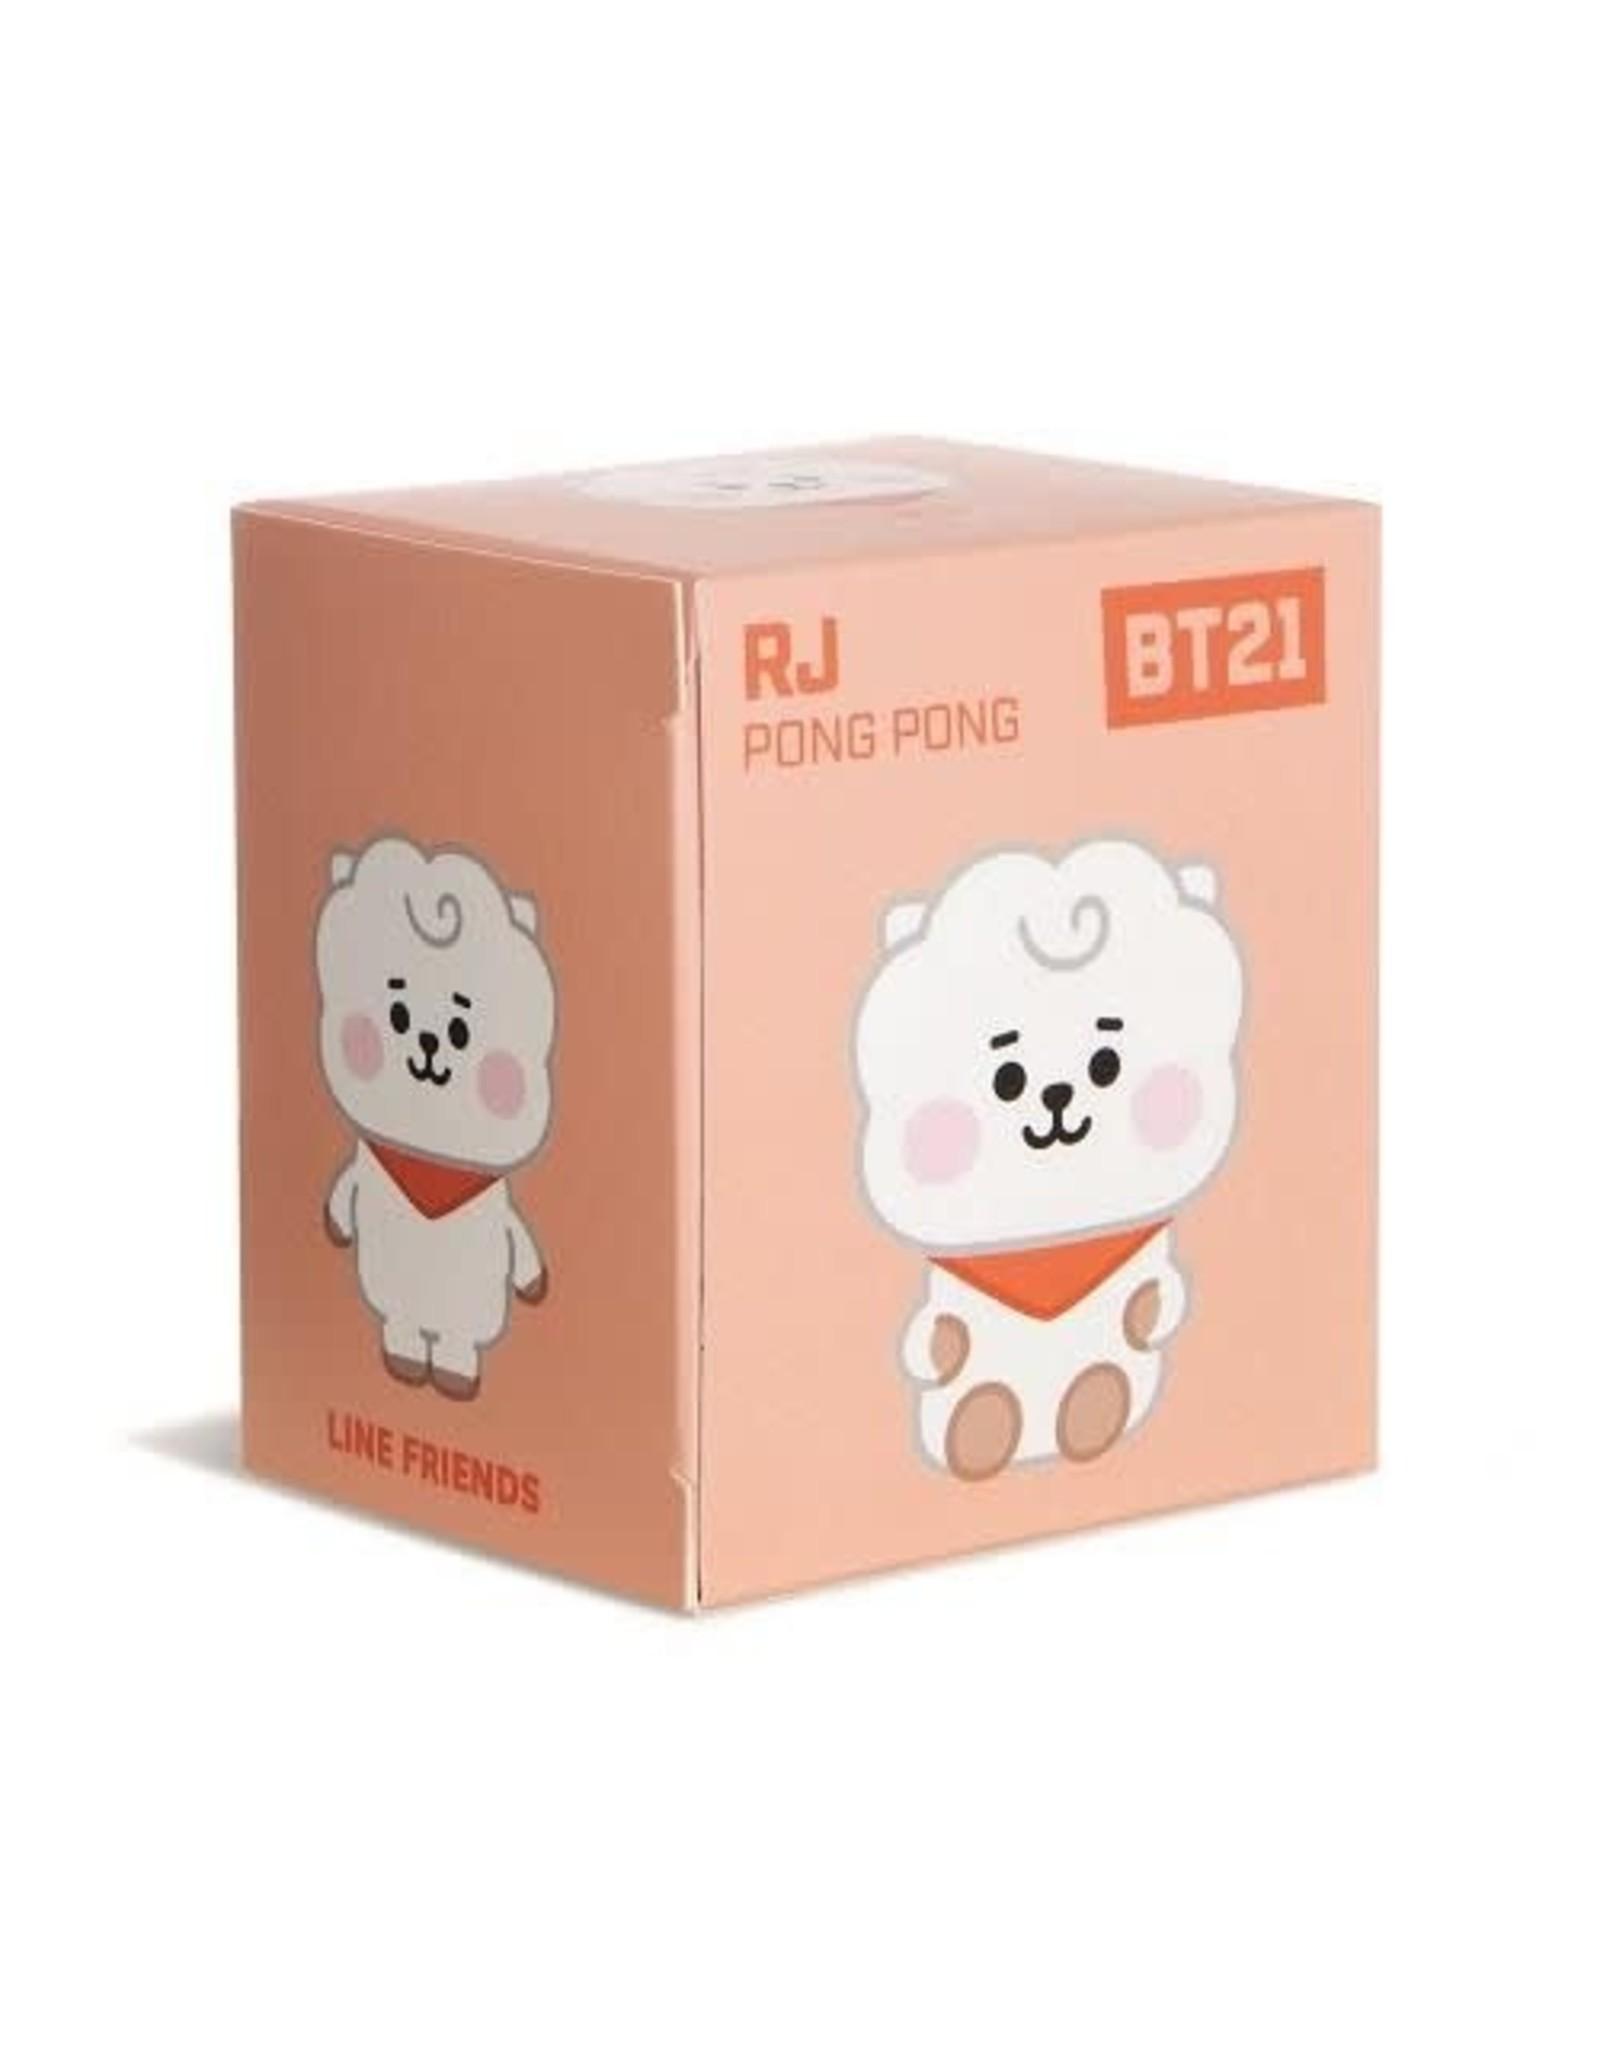 BT21 - Pong Pong Baby RJ - 8 cm